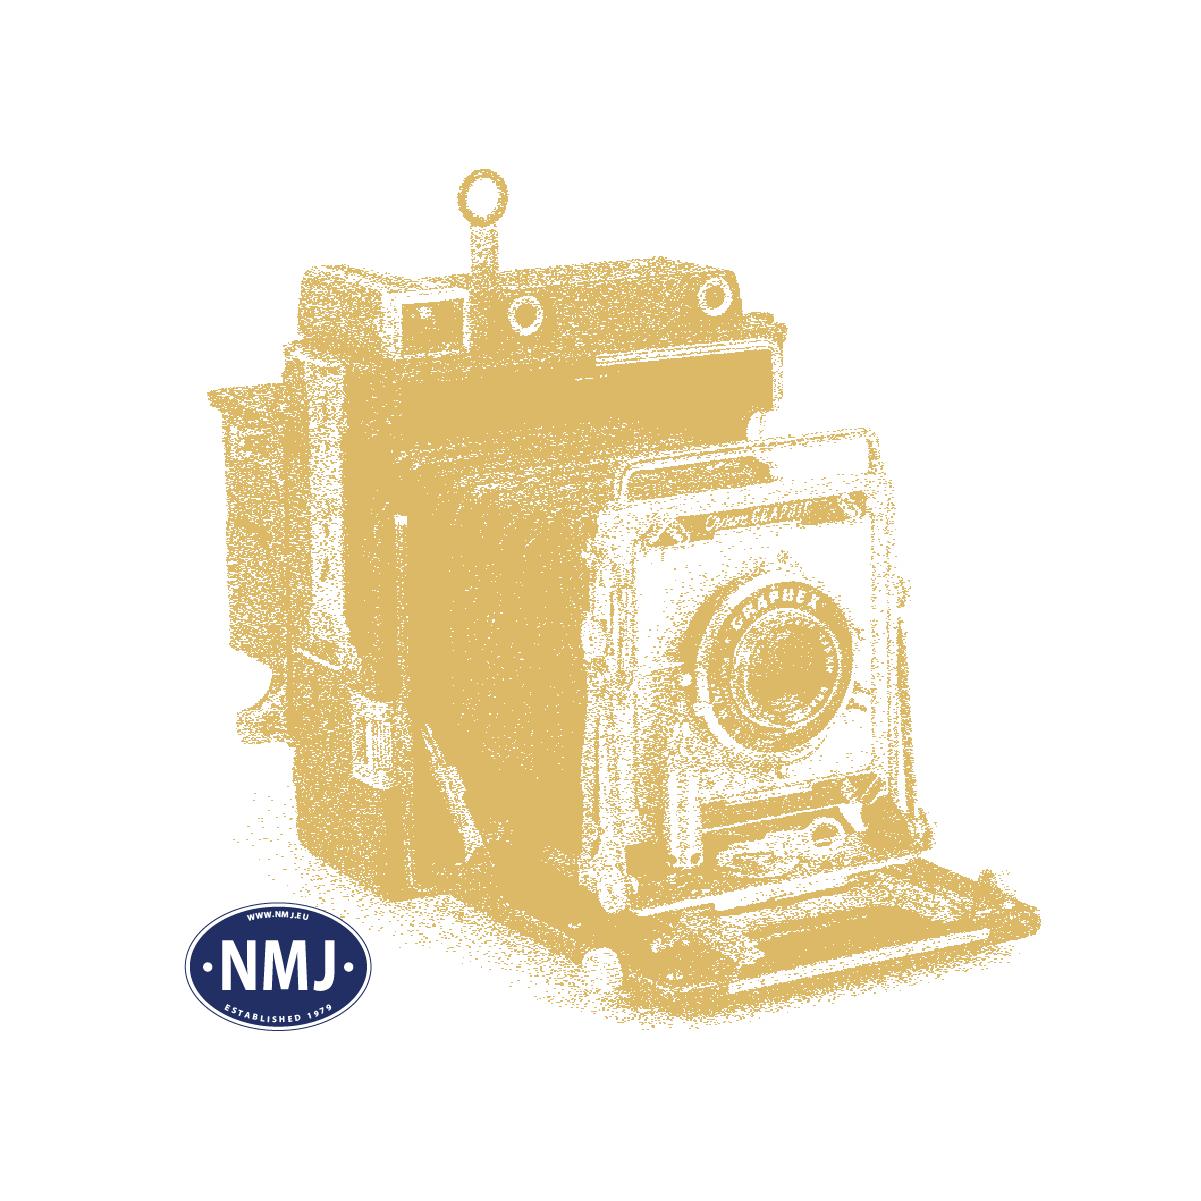 NMJ Superline NSB Damplokomotiv Type 39.170